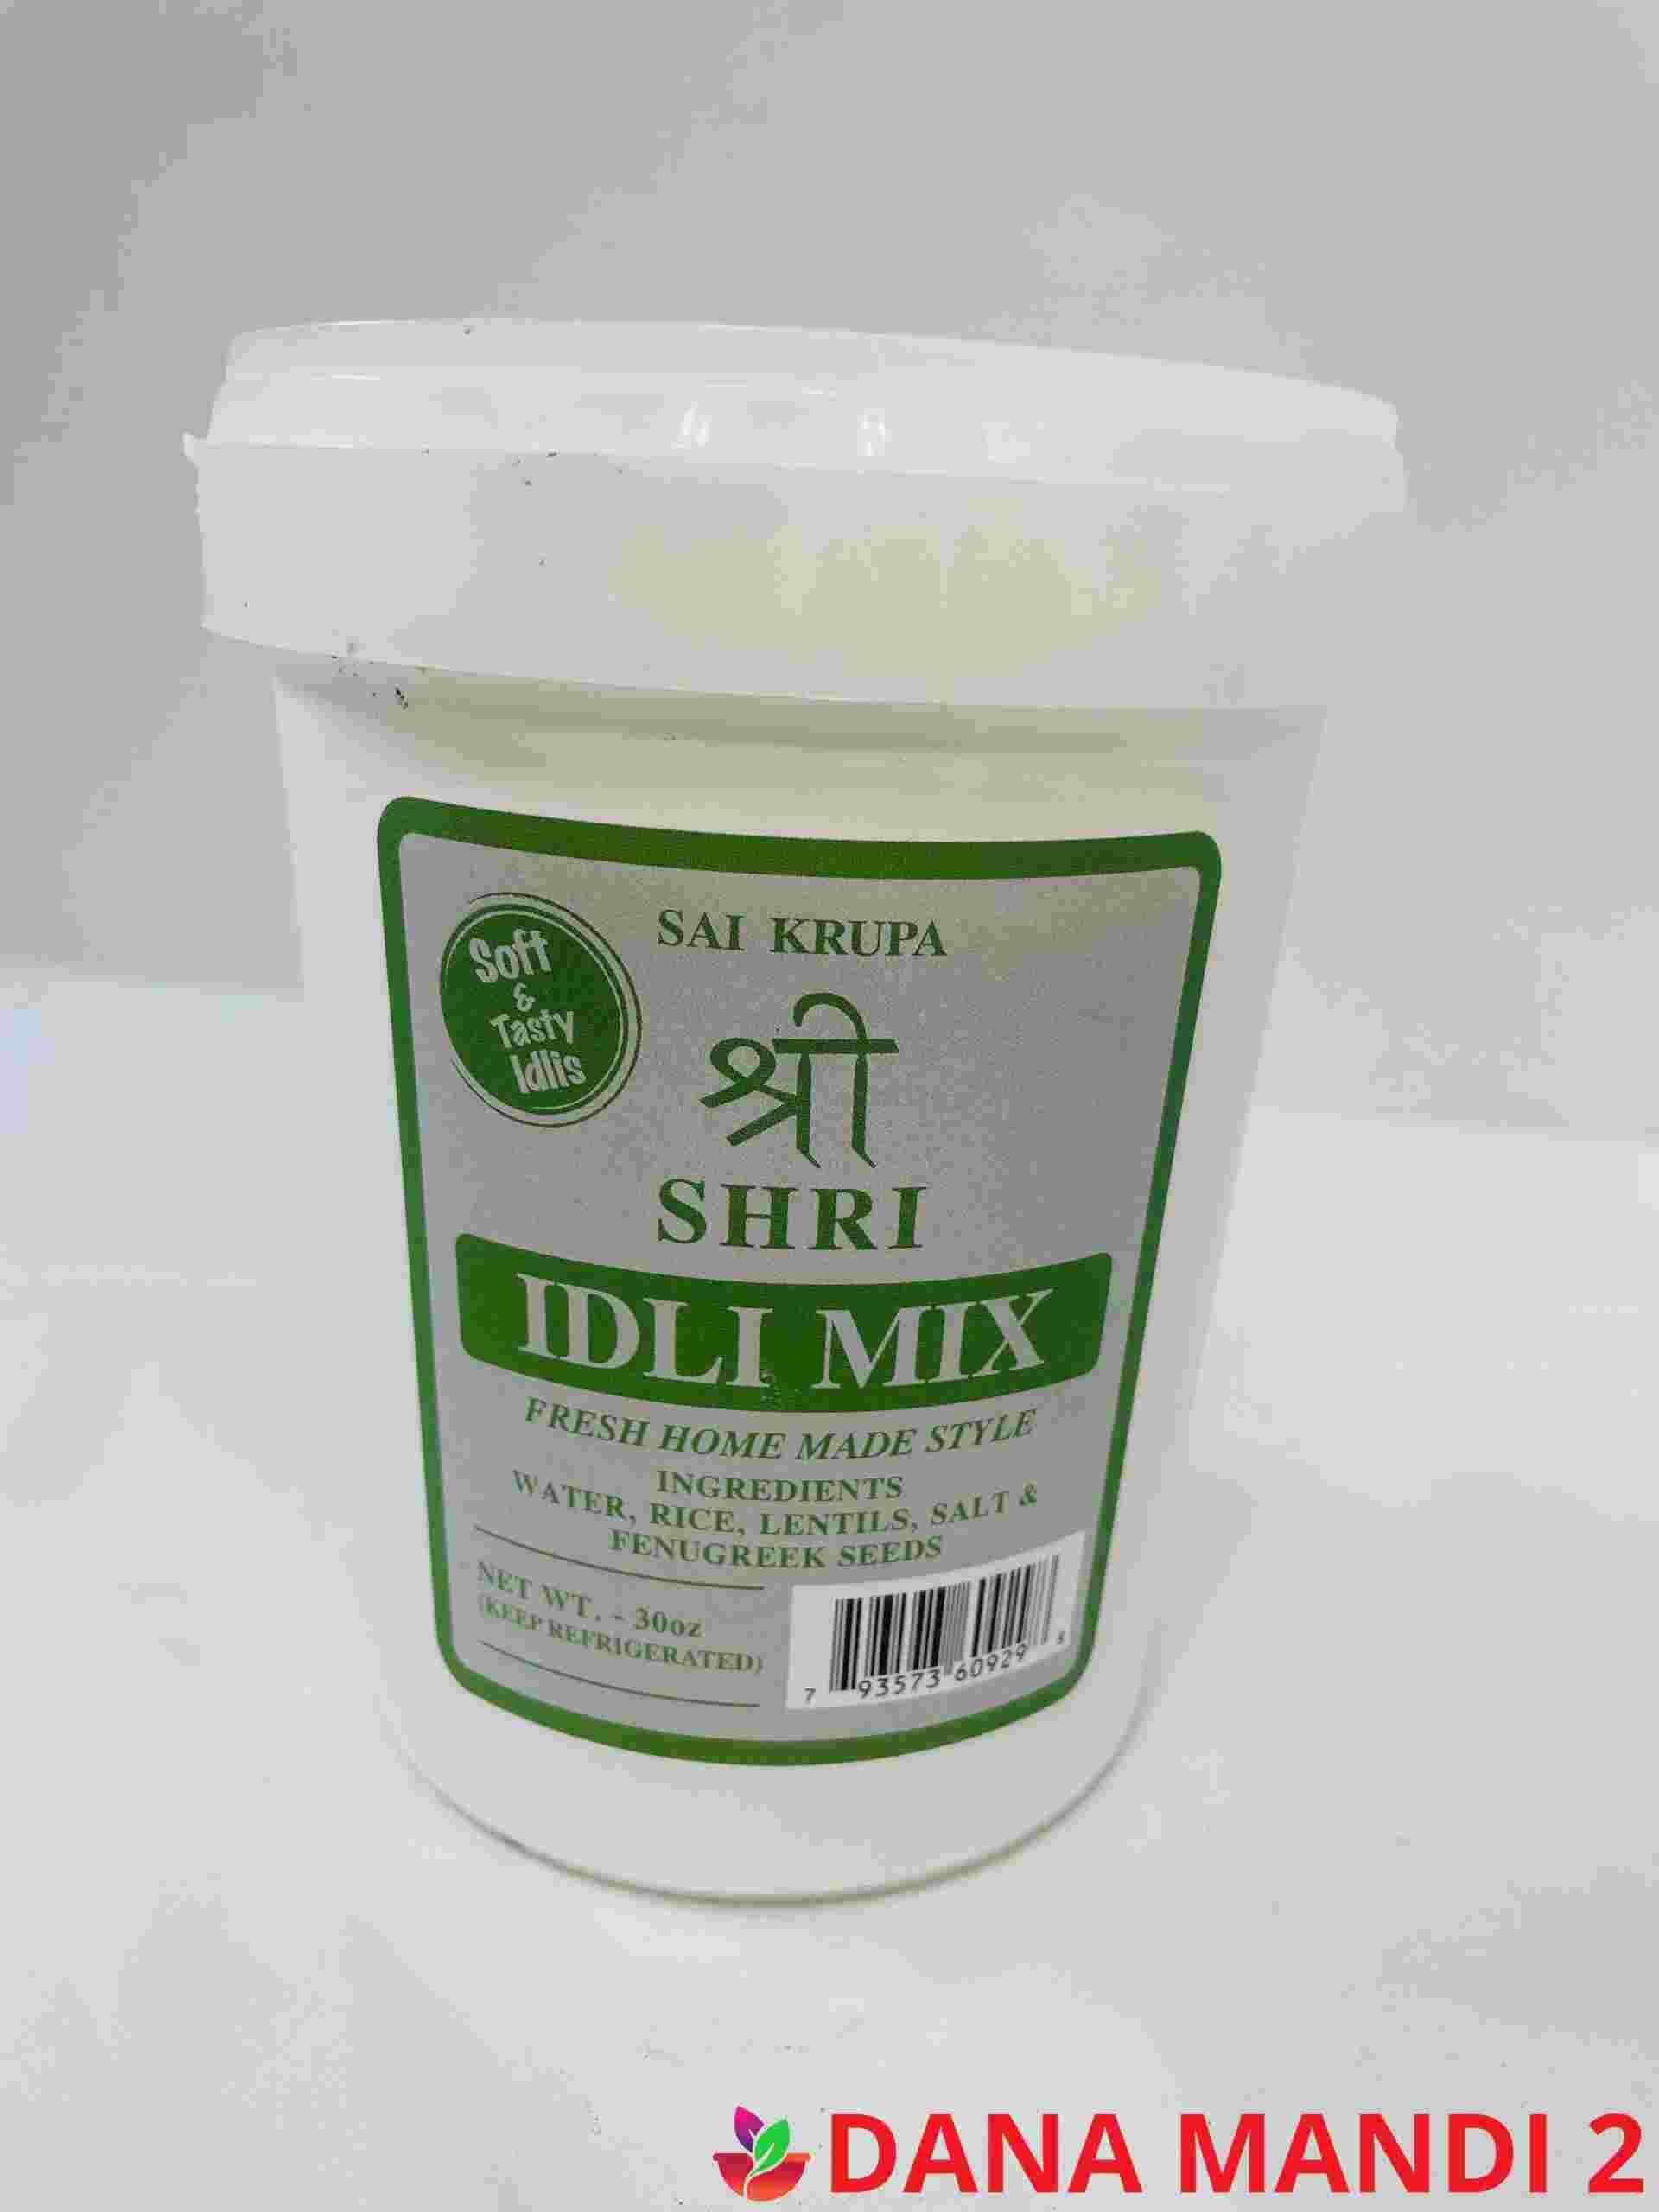 Shri Idli Mix